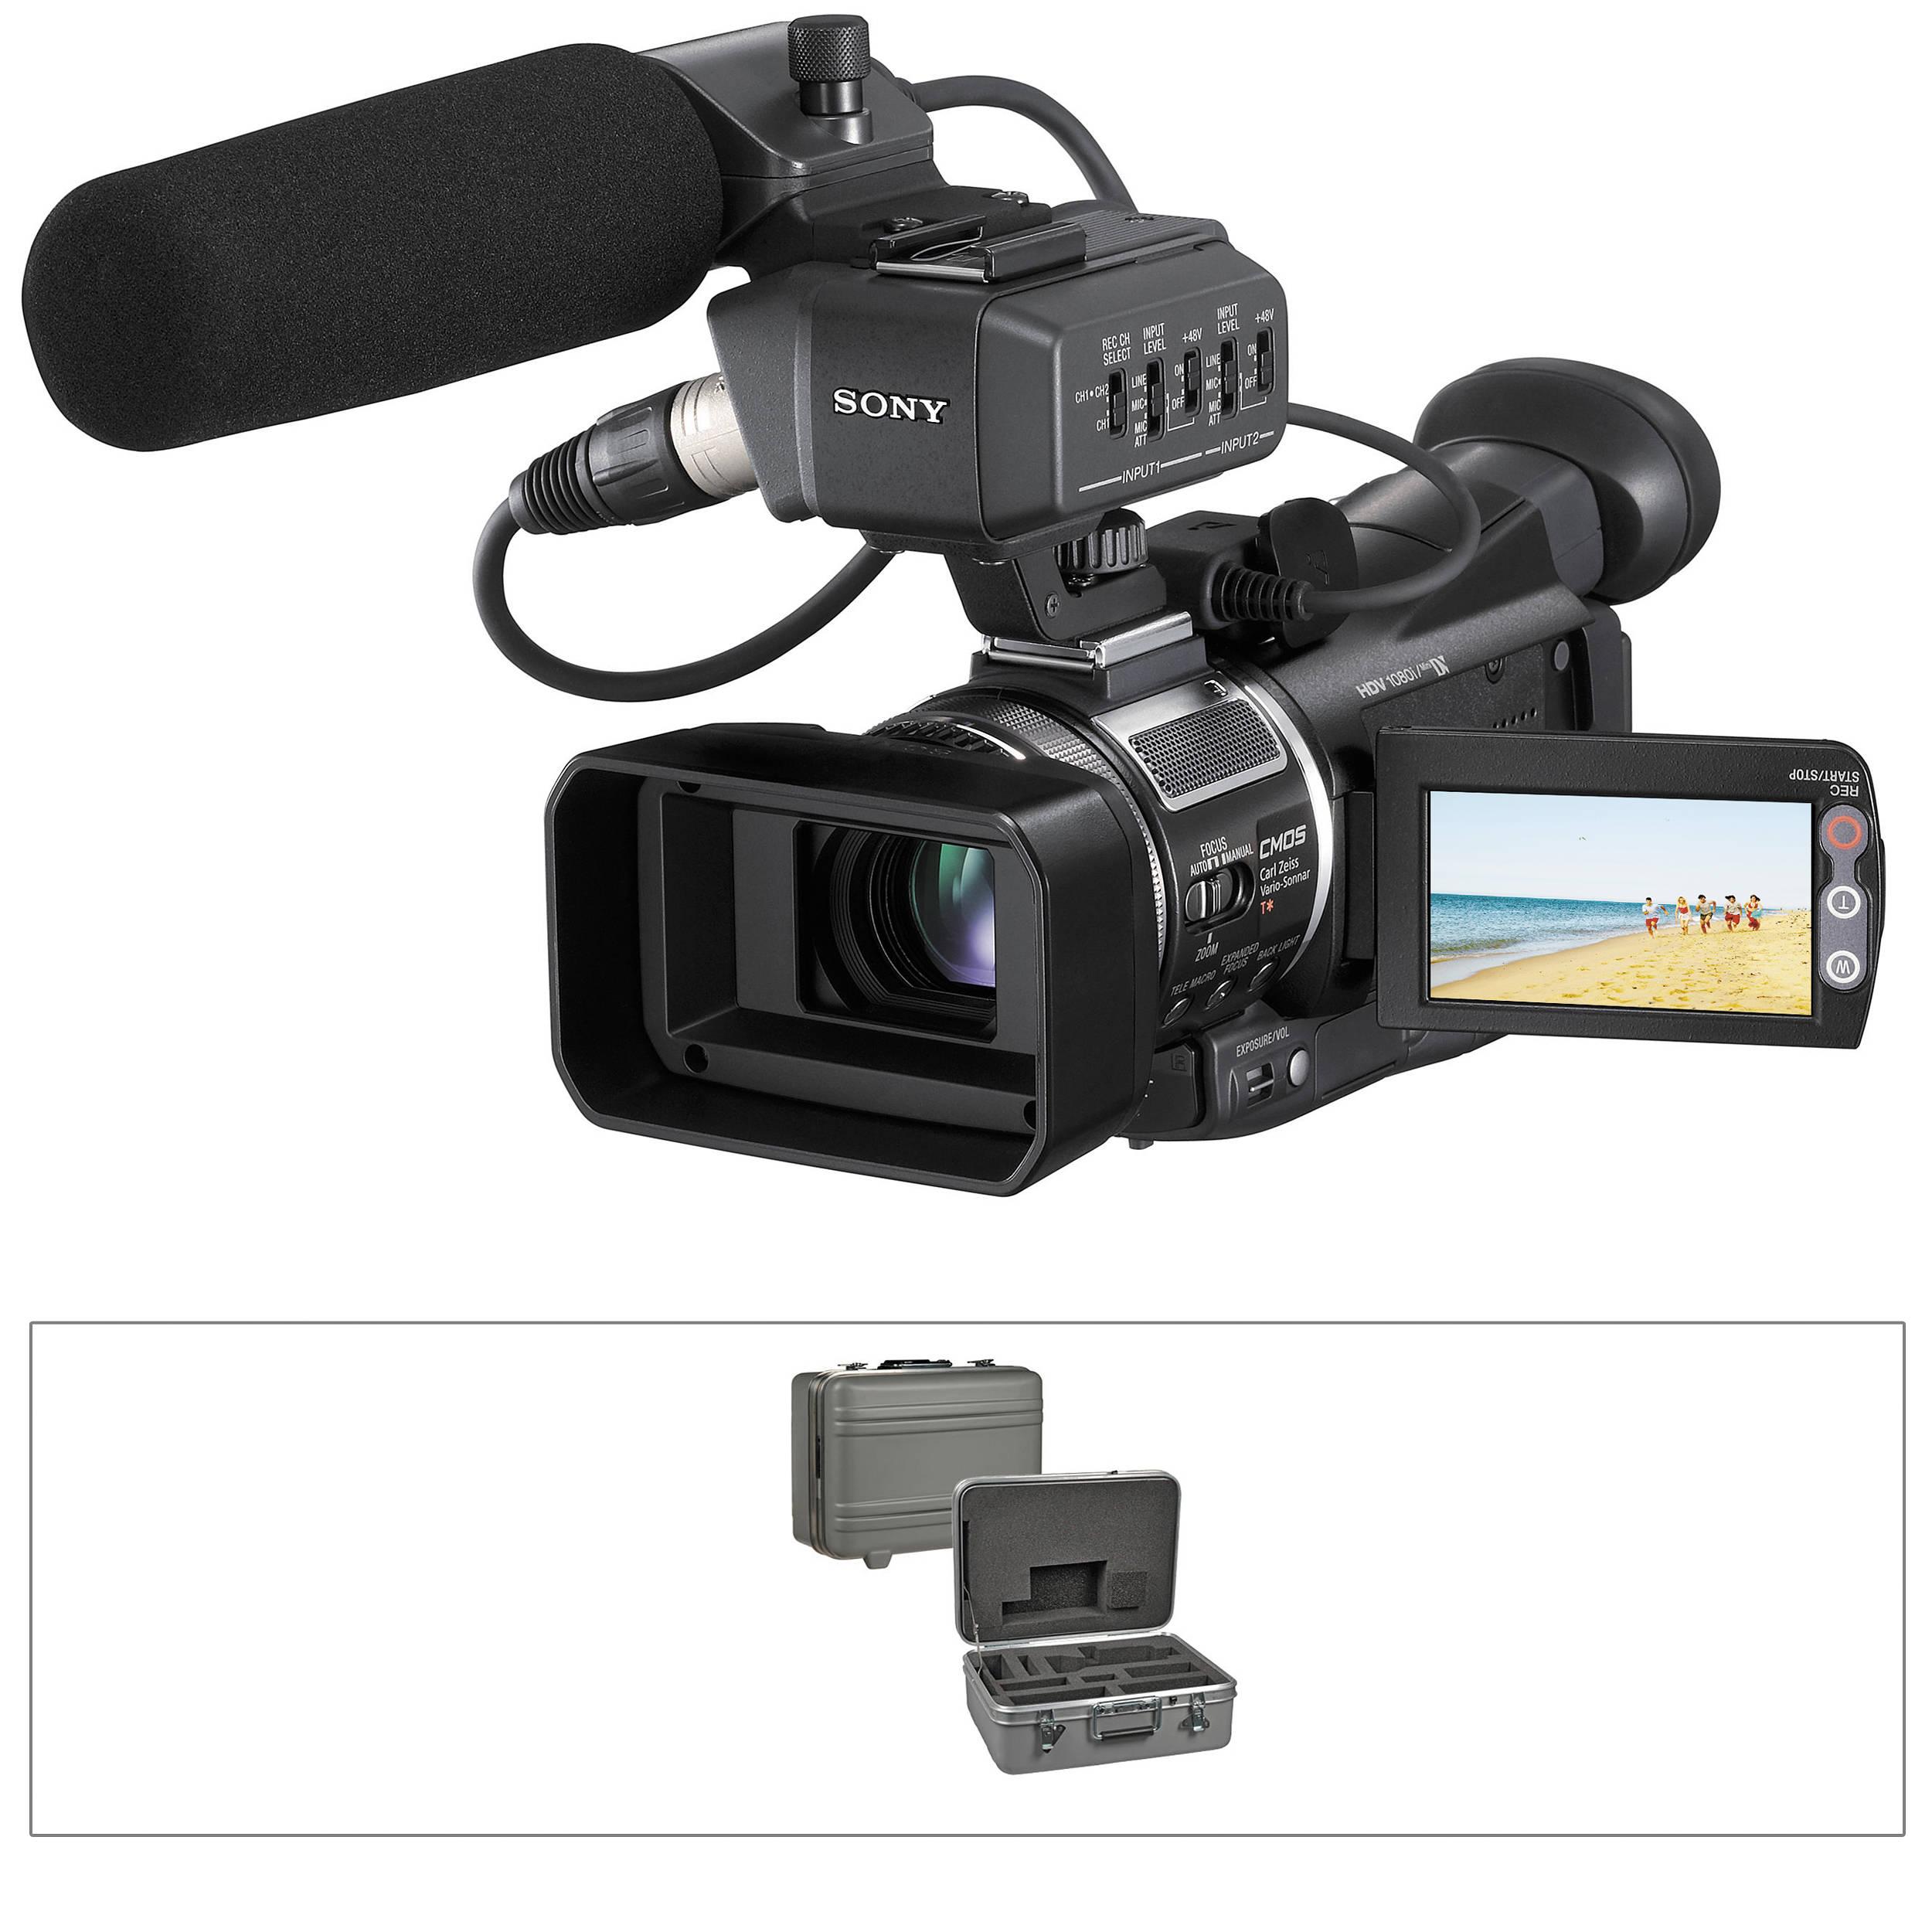 sony hvra1u hdv camcorder hvra1uthpac b h photo video rh bhphotovideo com Sony Handycam Manual sony hvr-a1u manual español